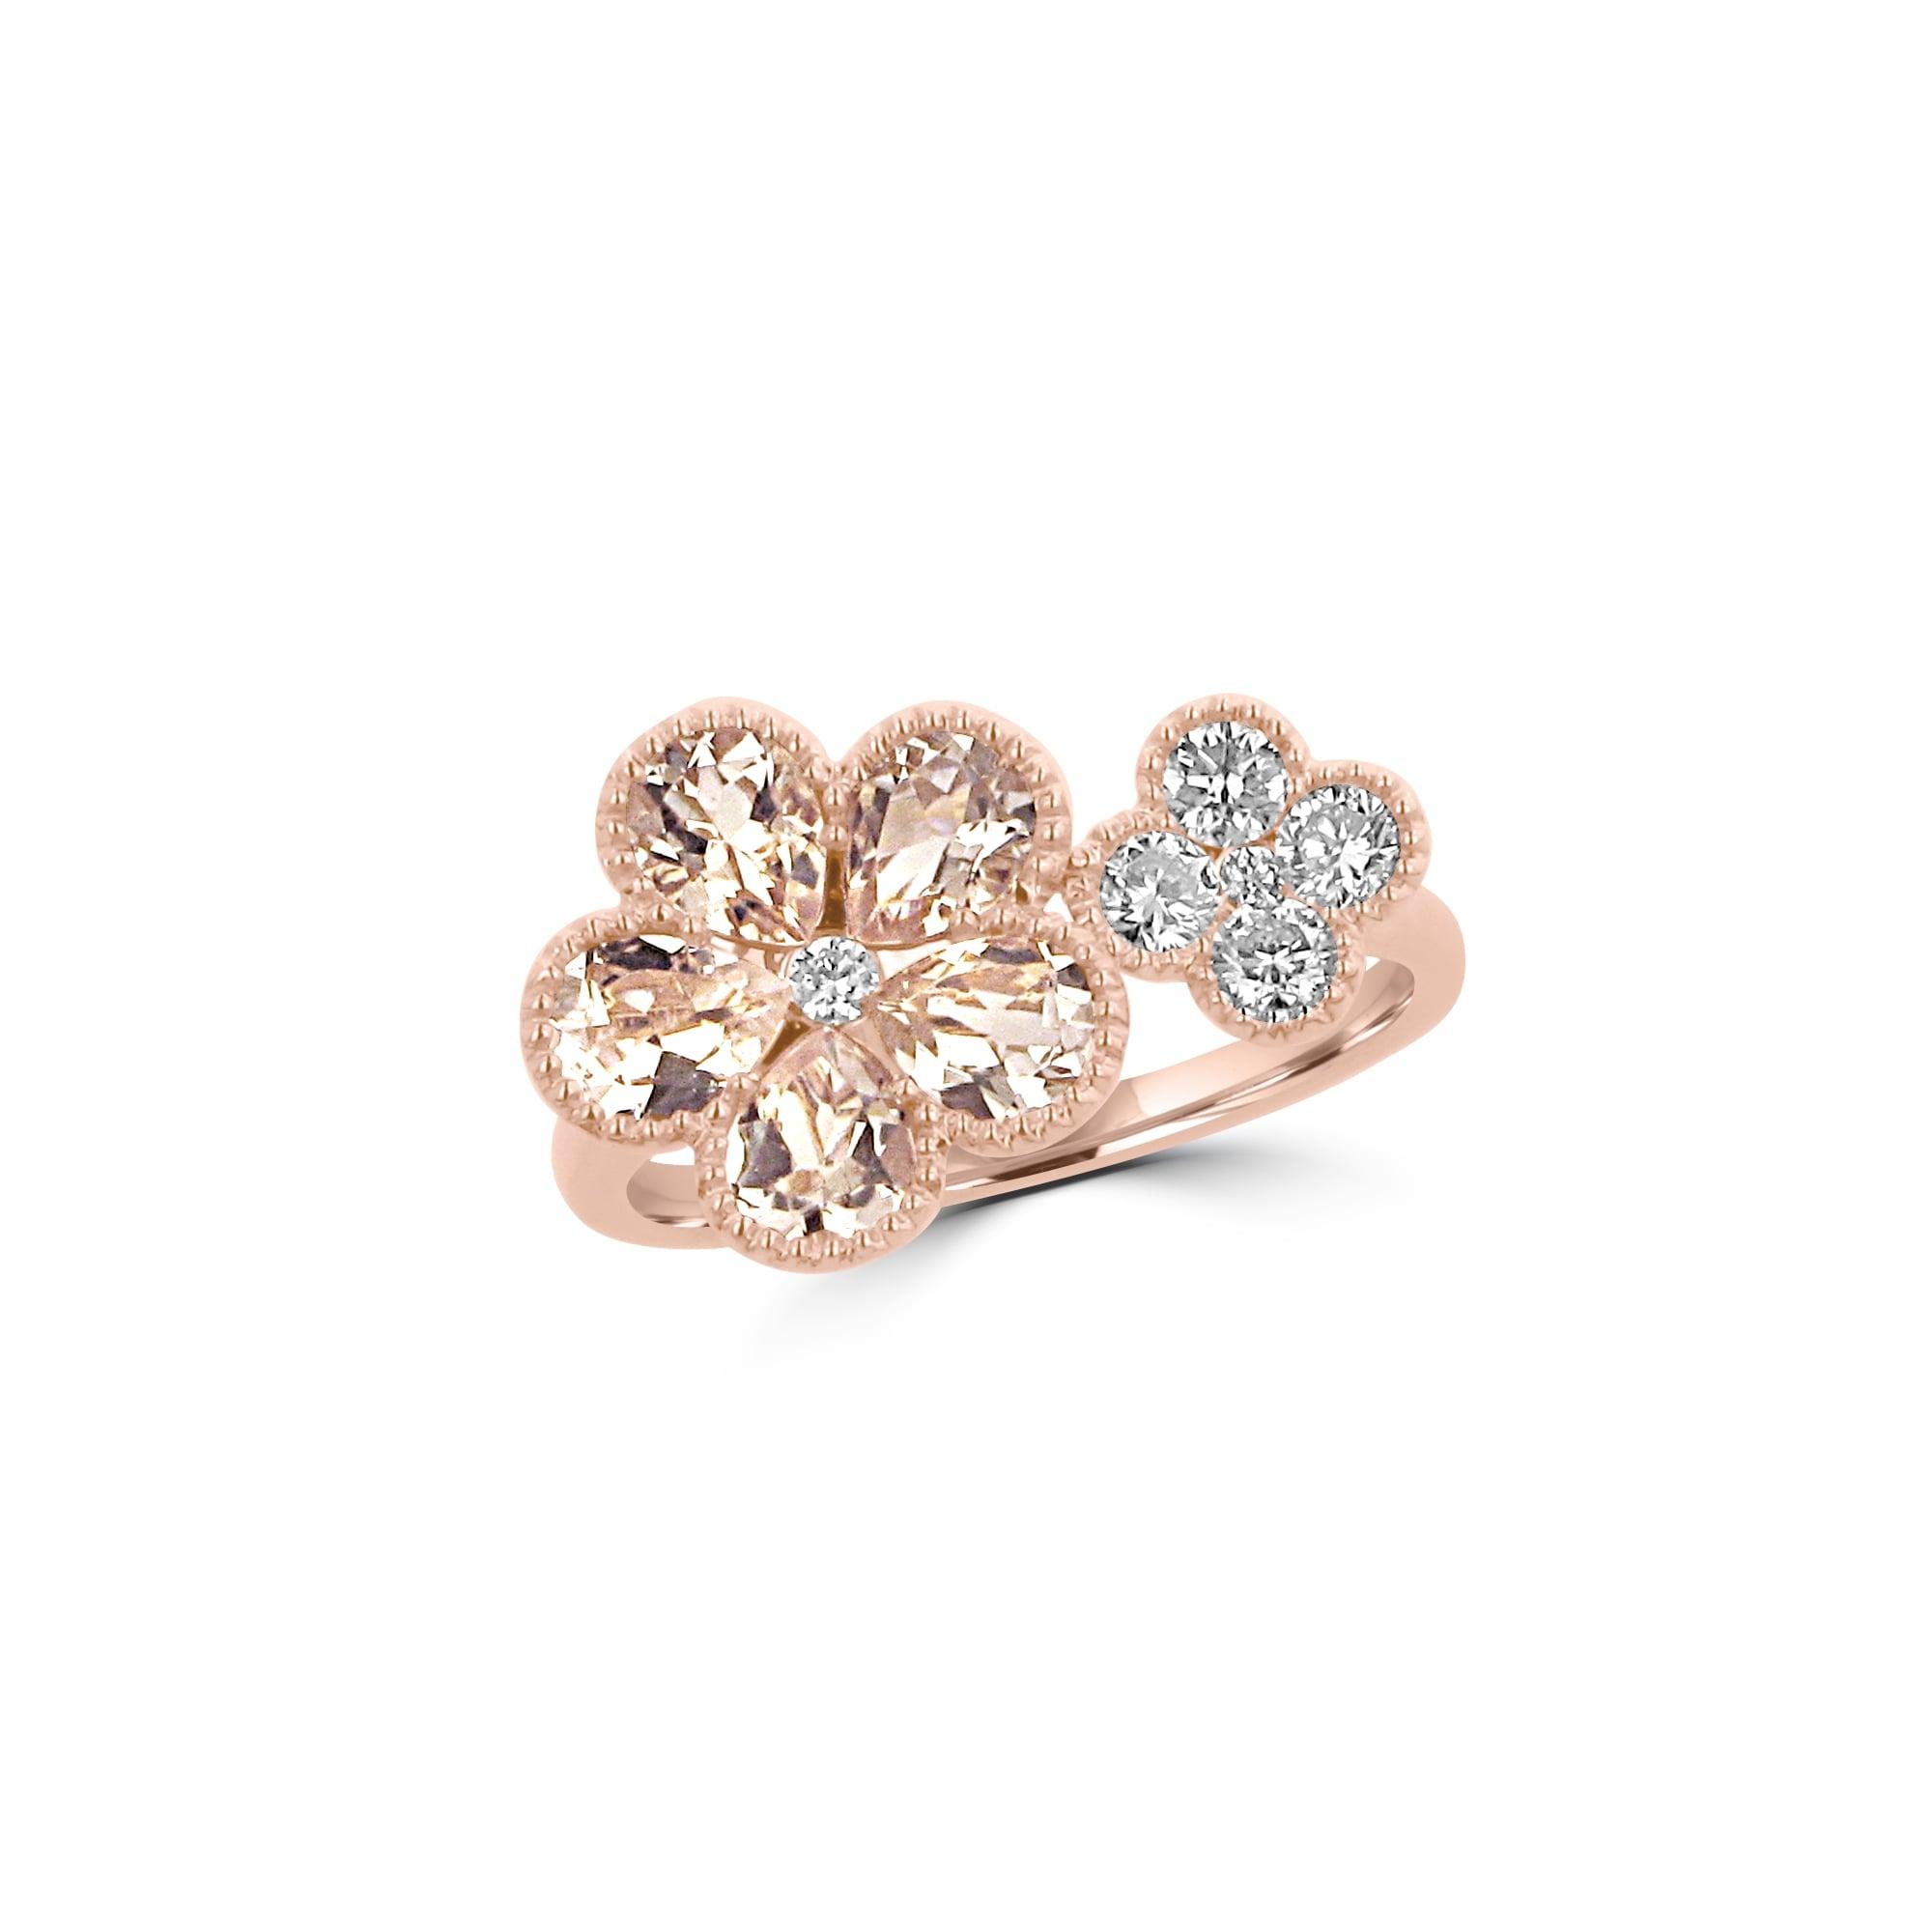 Rose Gold Morganite and Diamond Flower Ring - Womens from Avanti of  Ashbourne Ltd UK 32fb45f804